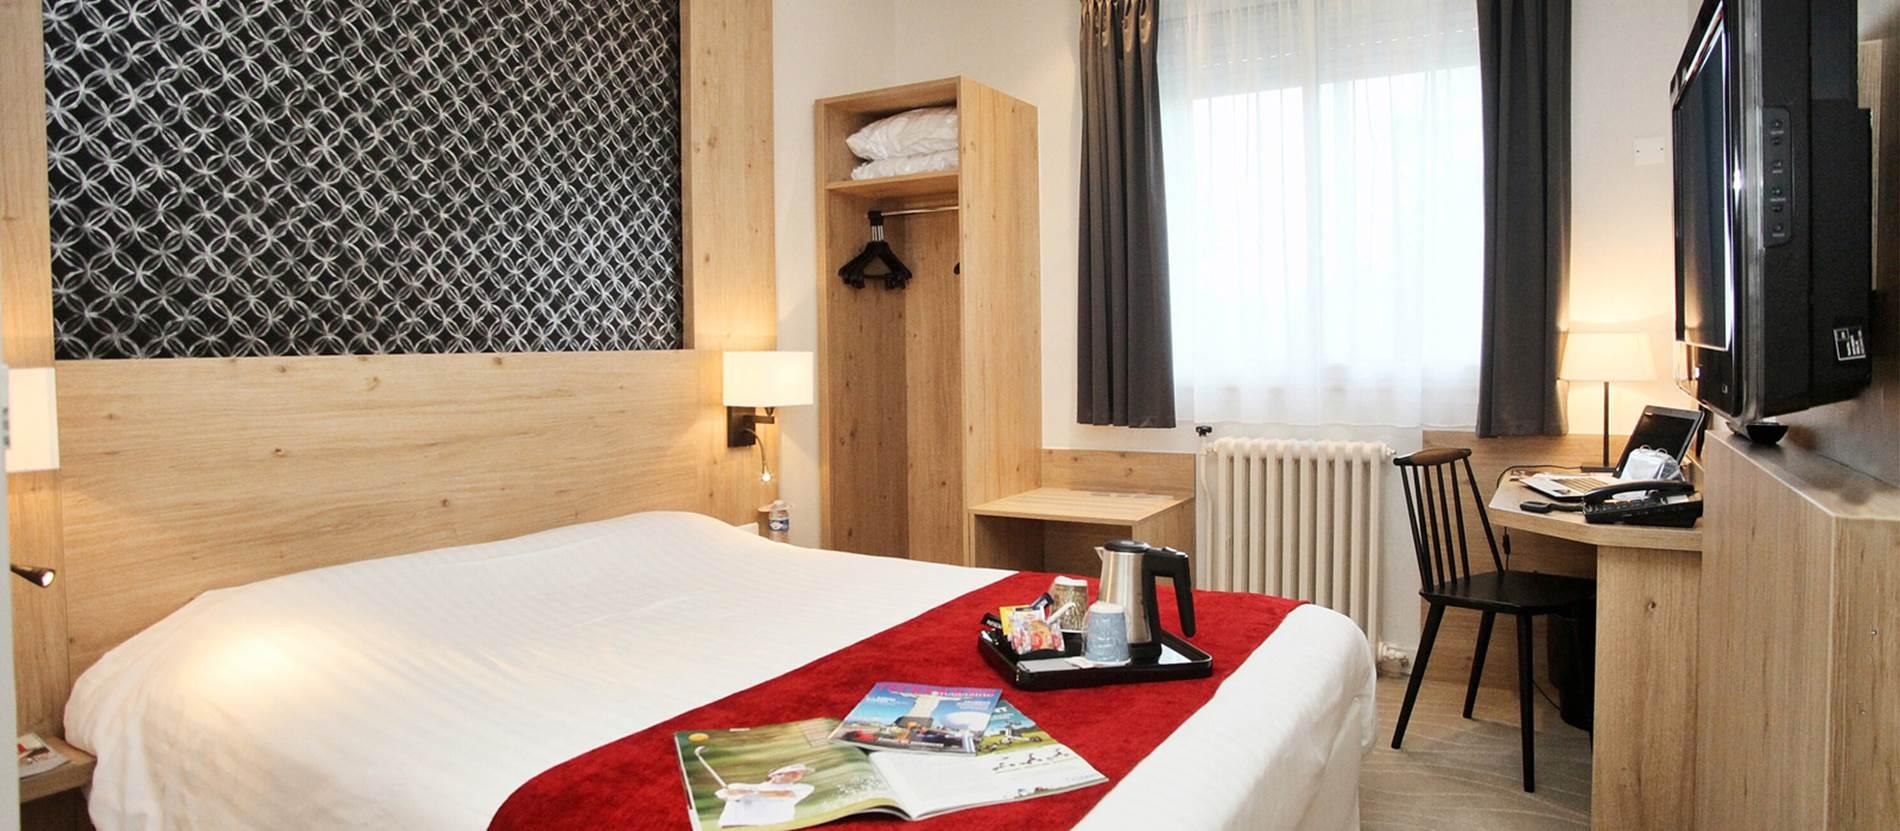 Hôtel-Restaurant-Kyriad-Centre-Vannes-Morbihan-Bretagne-Sud © Hôtel-Restaurant-Kyriad-Centre-Vannes